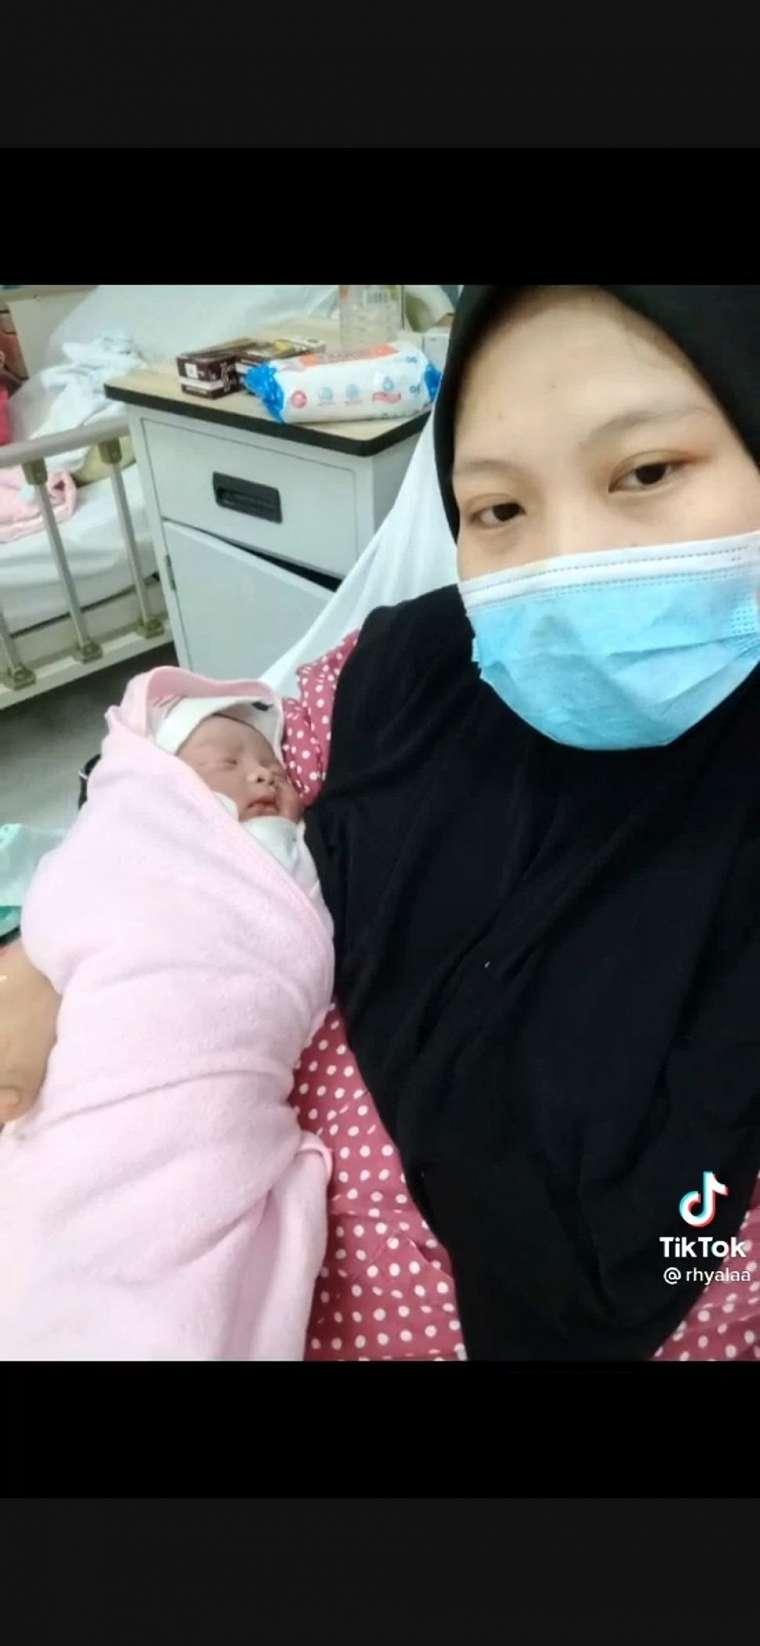 Salah Prediksi Jenis Kelamin, Bayi Laki-laki Ini Dipakaikan Ibunya Perlengkapan Pink. (Dok: TikTok/@rhyalaa)